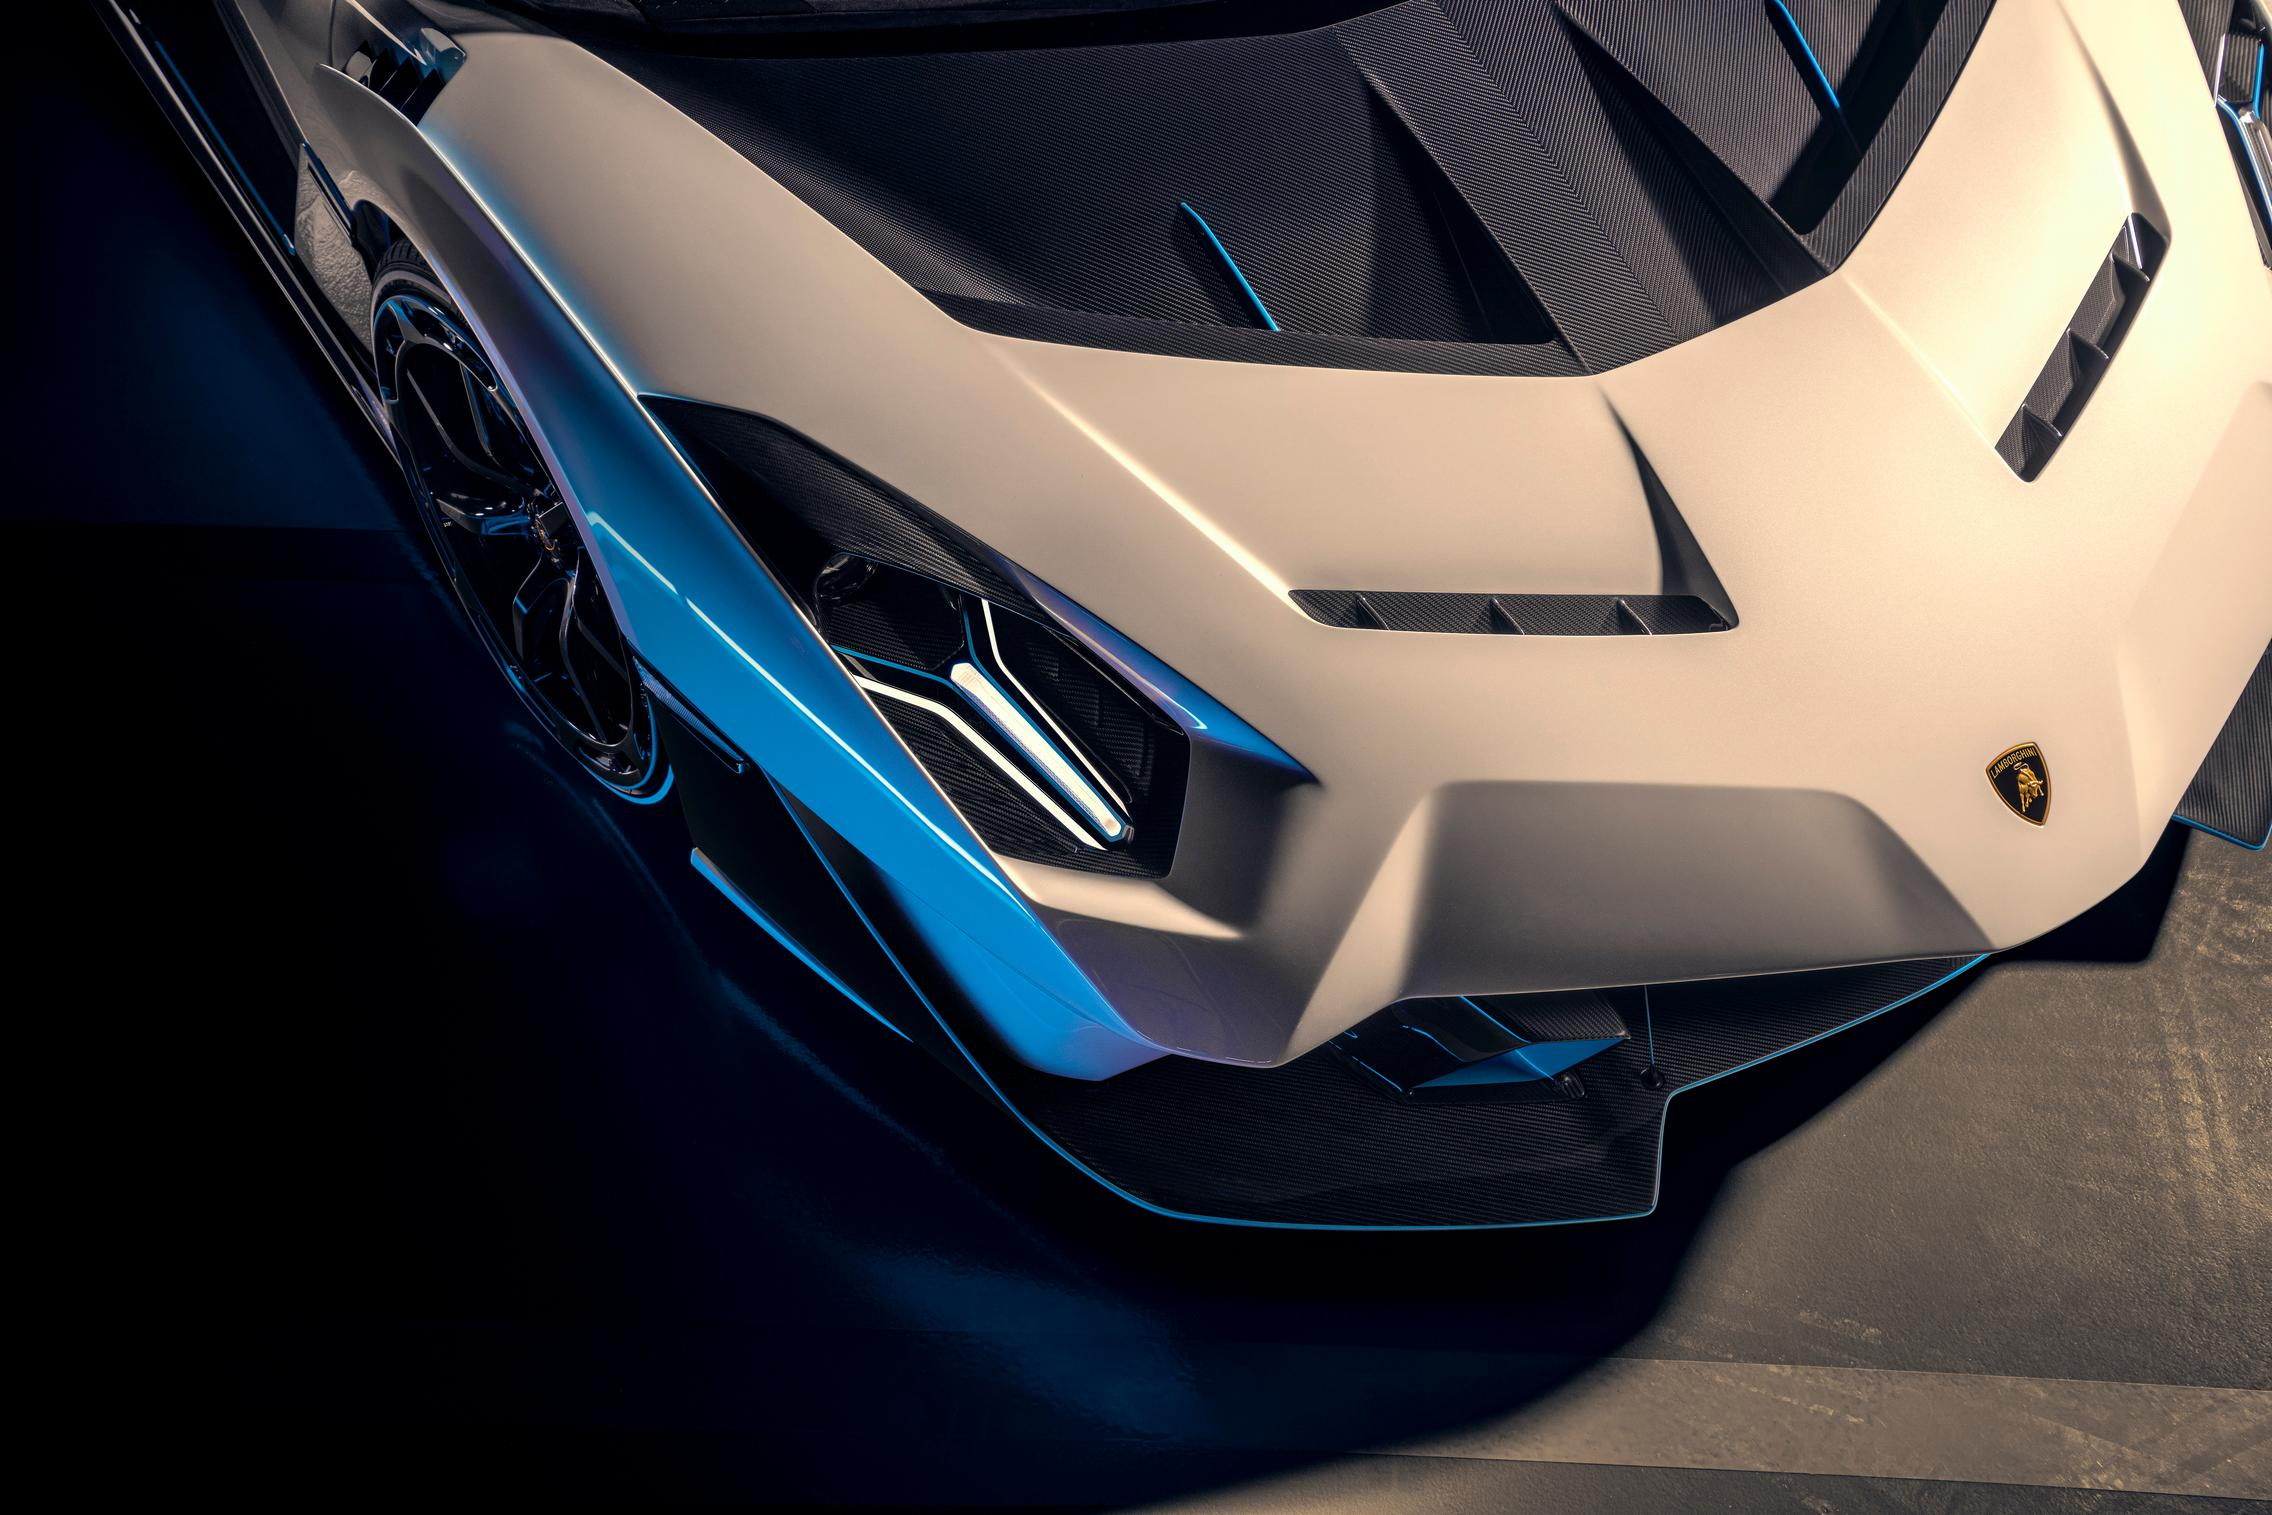 Lamborghini SC20 headlight